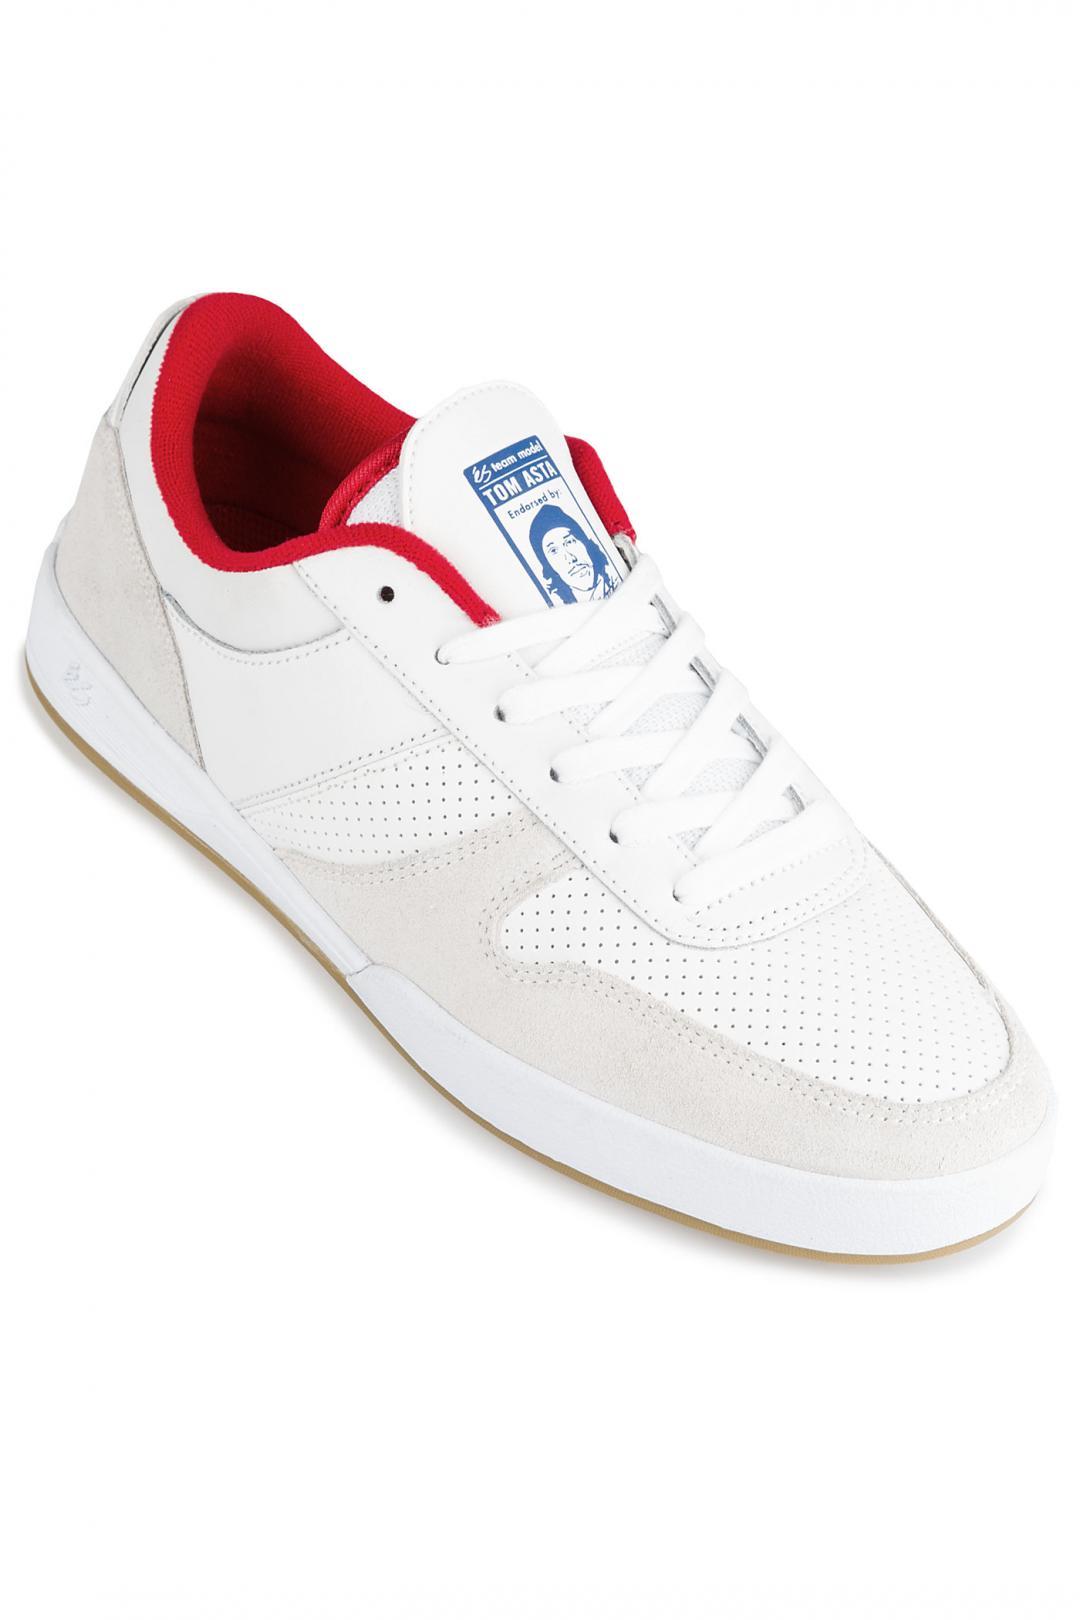 Uomo éS Contract white | Sneaker